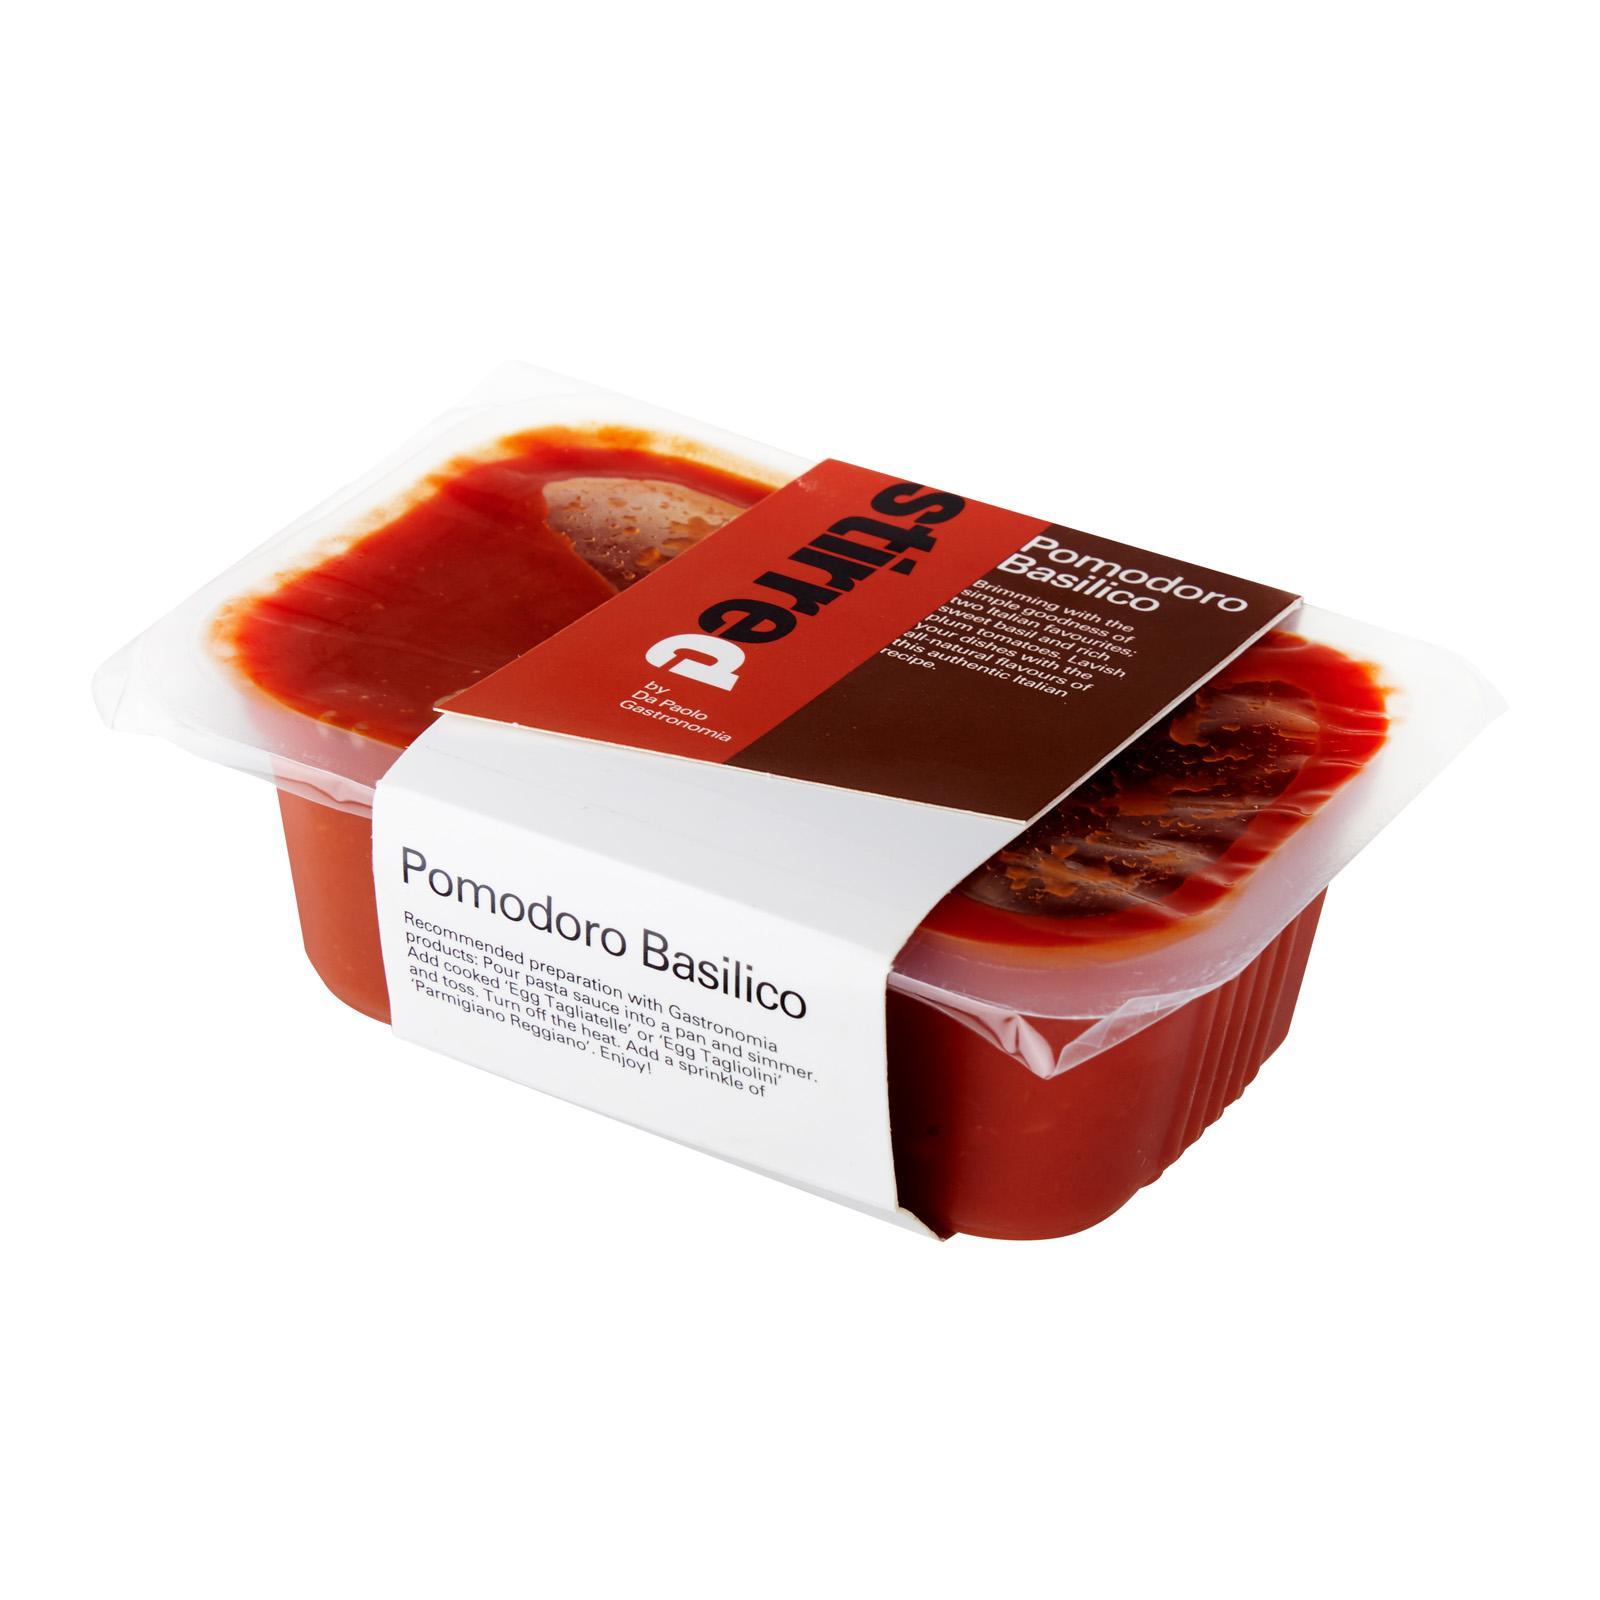 Da Paolo Pomodoro Basilico Pasta Sauce Fresh By Redmart.